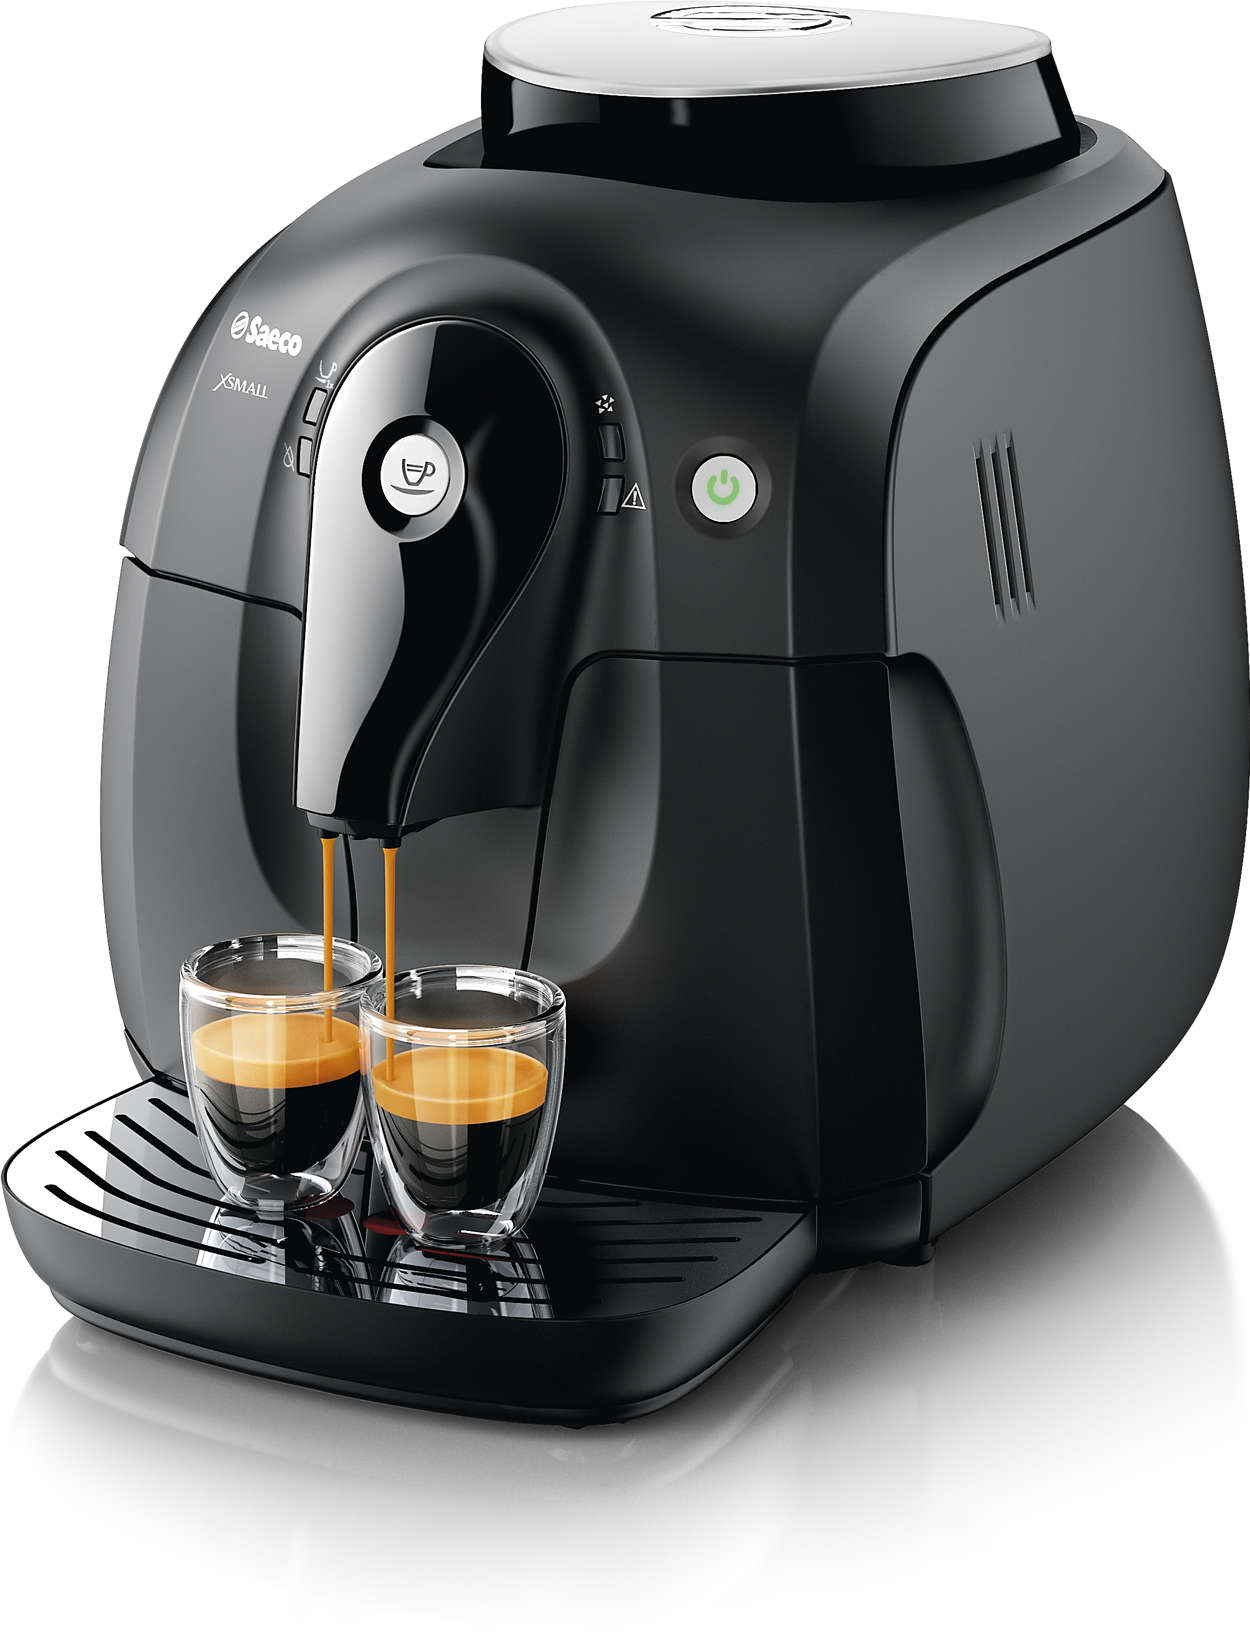 xsmall machine espresso super automatique hd8642 01 saeco. Black Bedroom Furniture Sets. Home Design Ideas